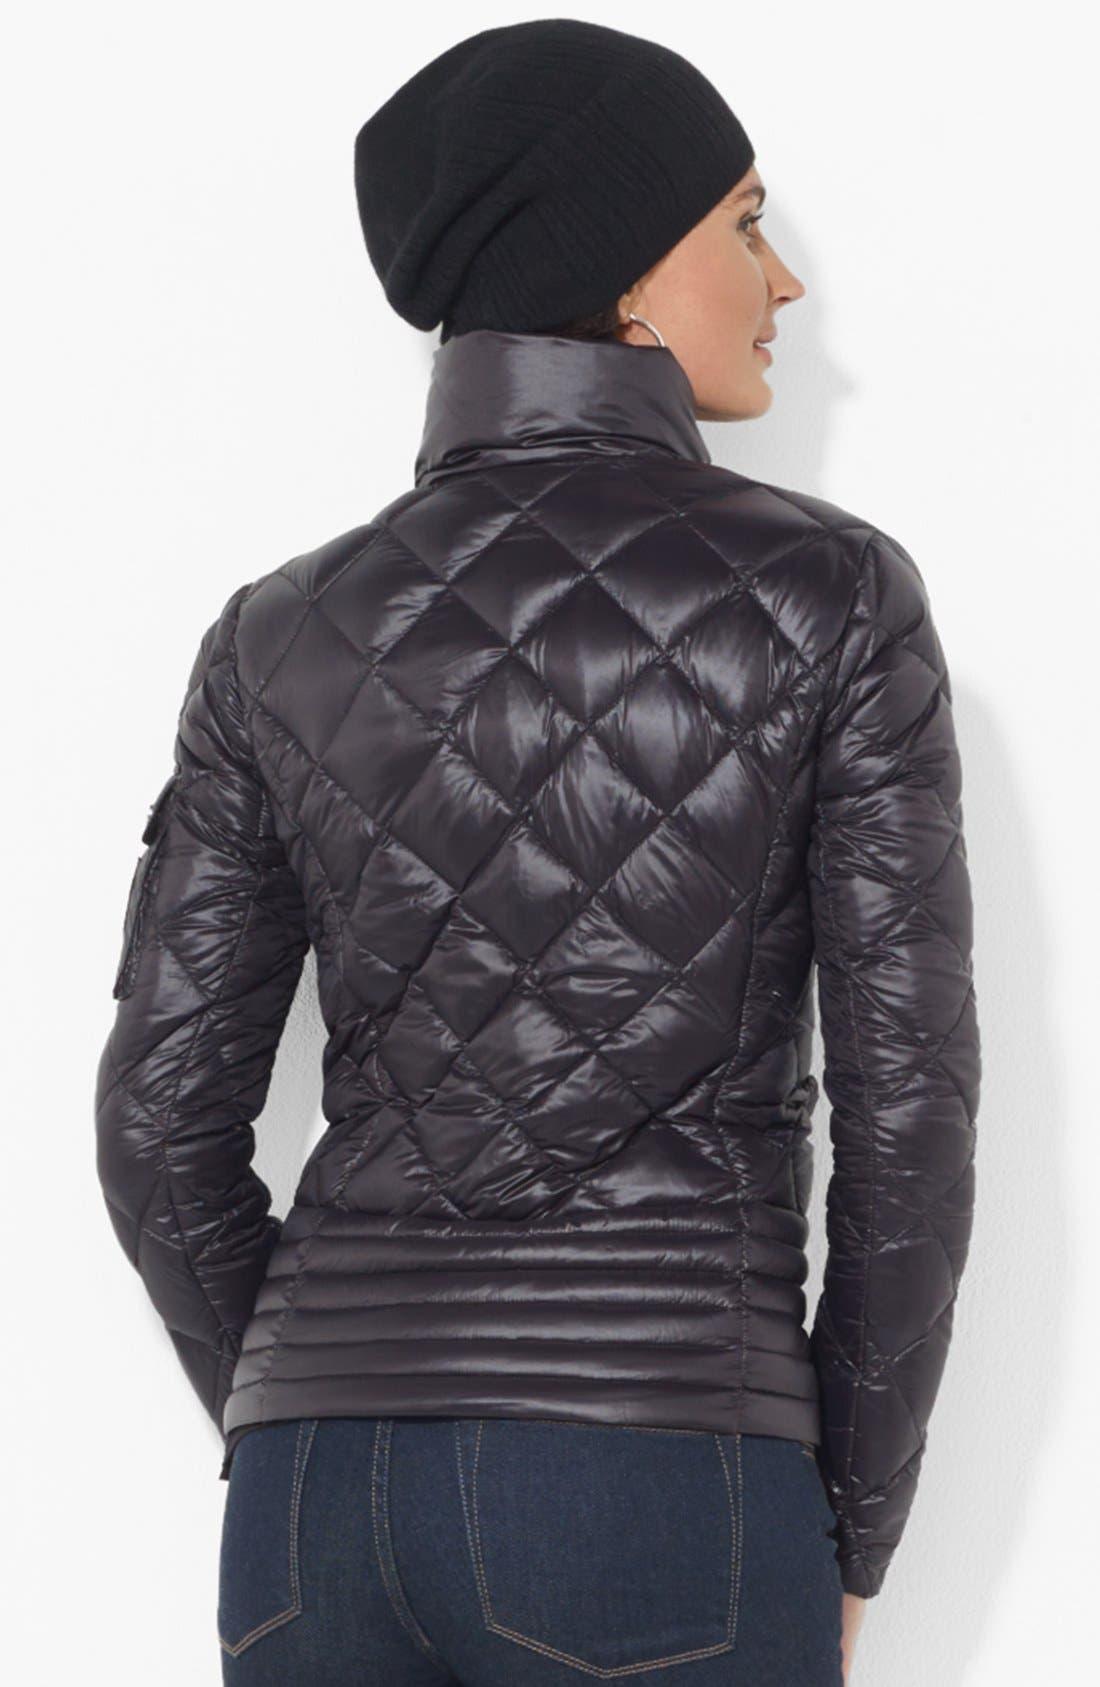 Mixed Quilt Packable Down Jacket,                             Alternate thumbnail 2, color,                             Black